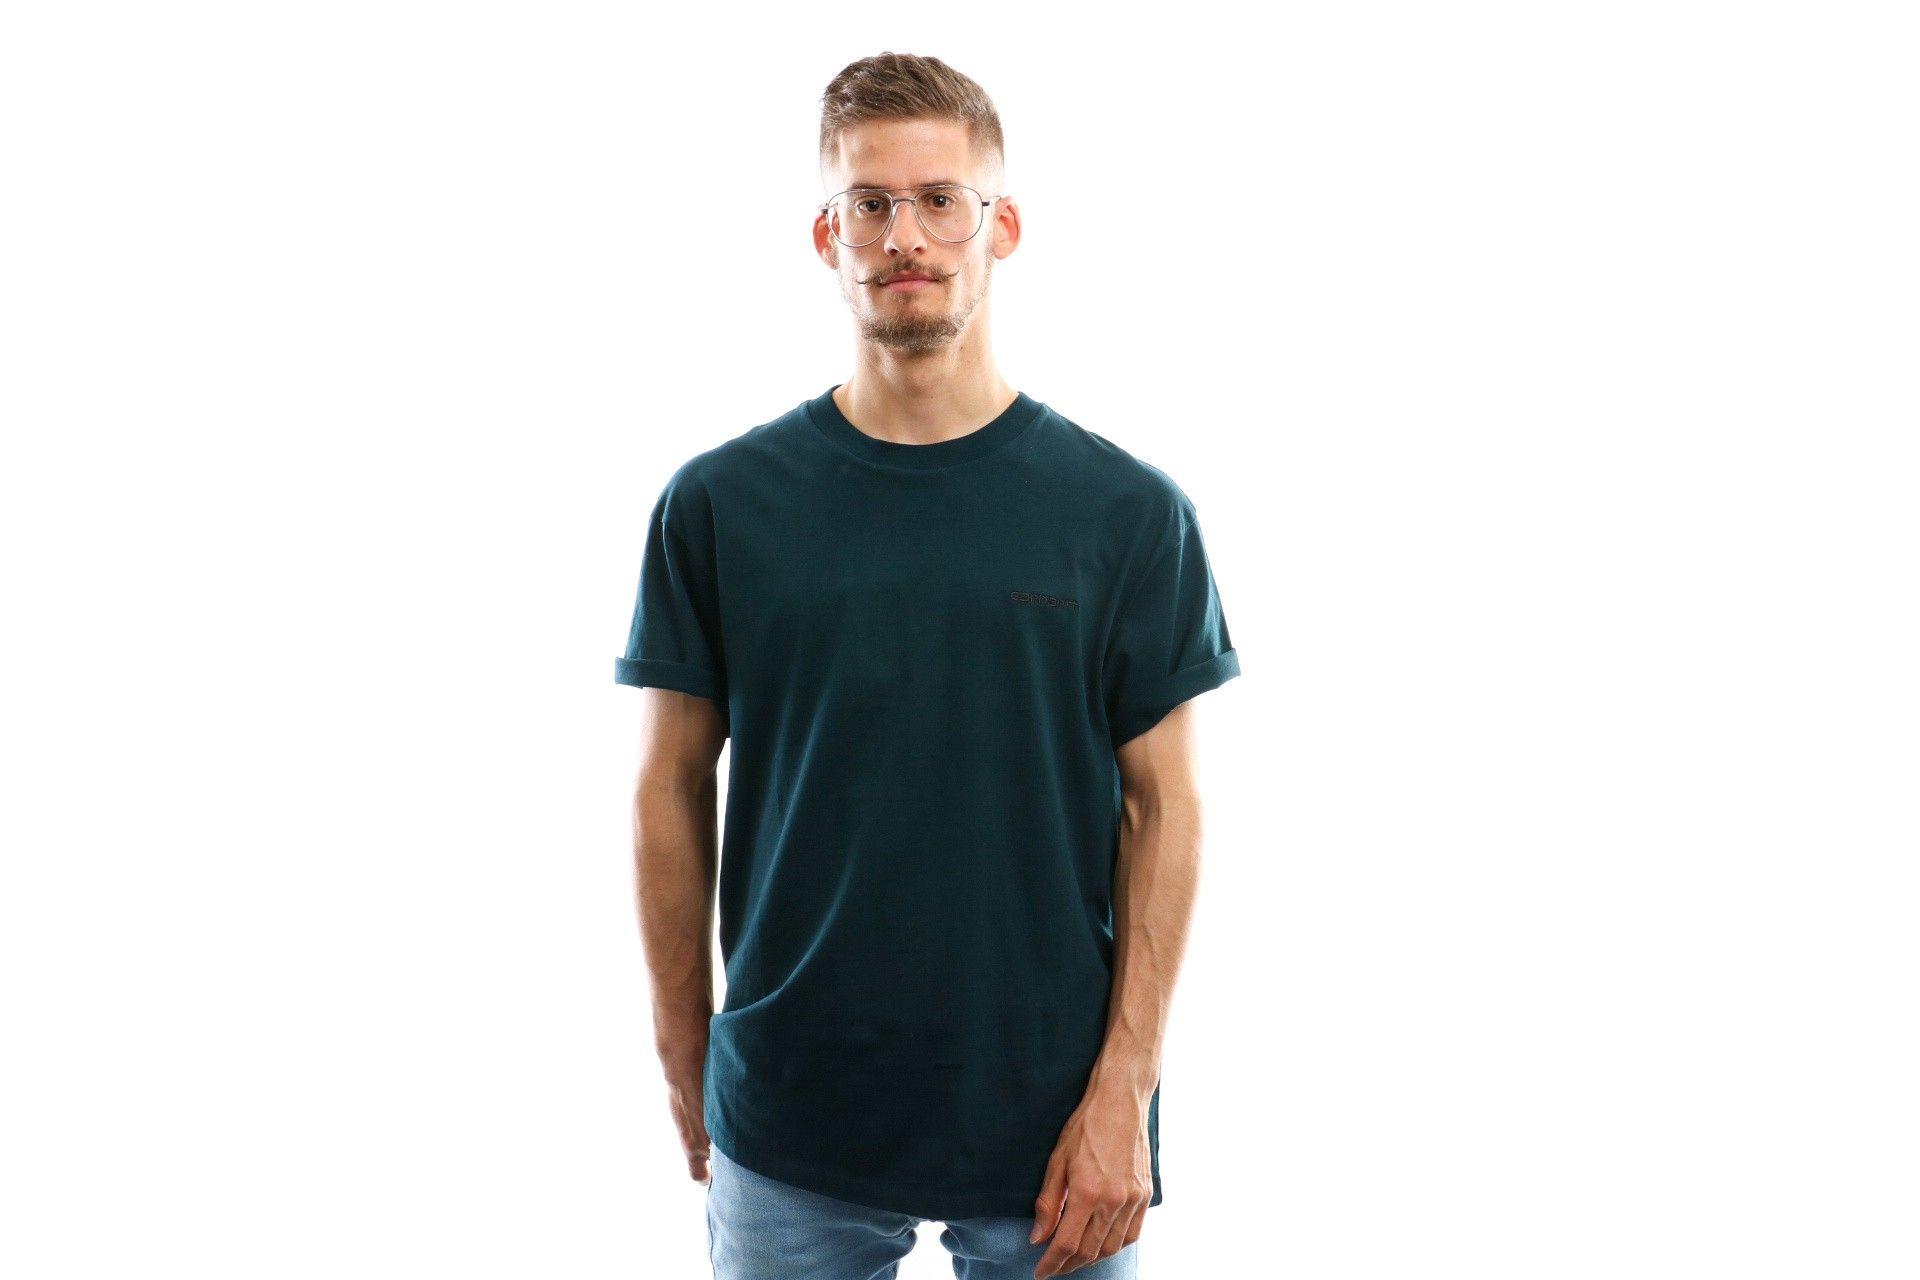 Afbeelding van Carhartt Wip S/S Script Embroidery T-Shirt I025778 T Shirt Duck Blue / Black